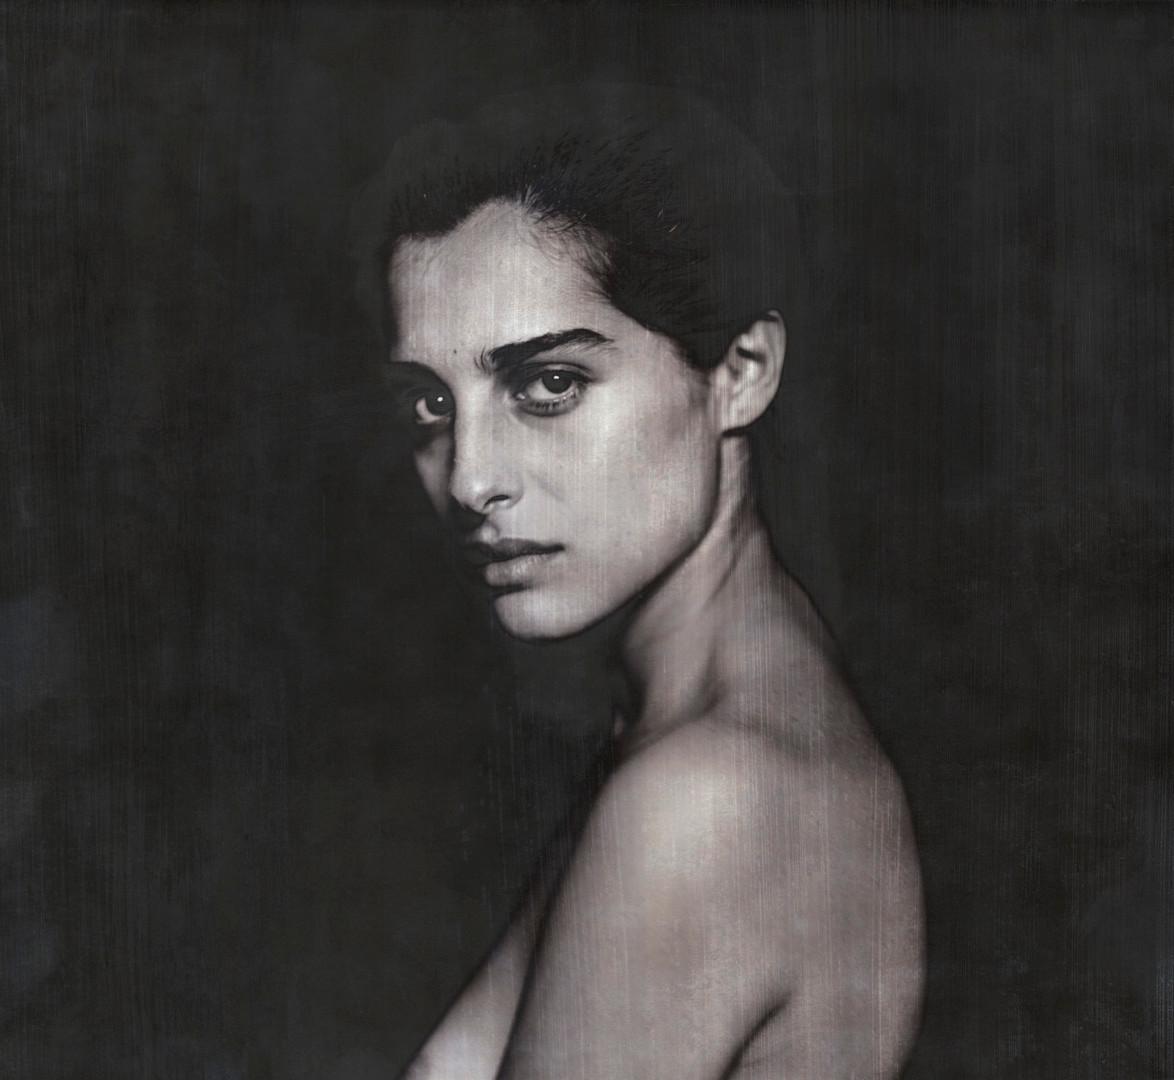 Paolo Roversi, Amira, Paris, 1990